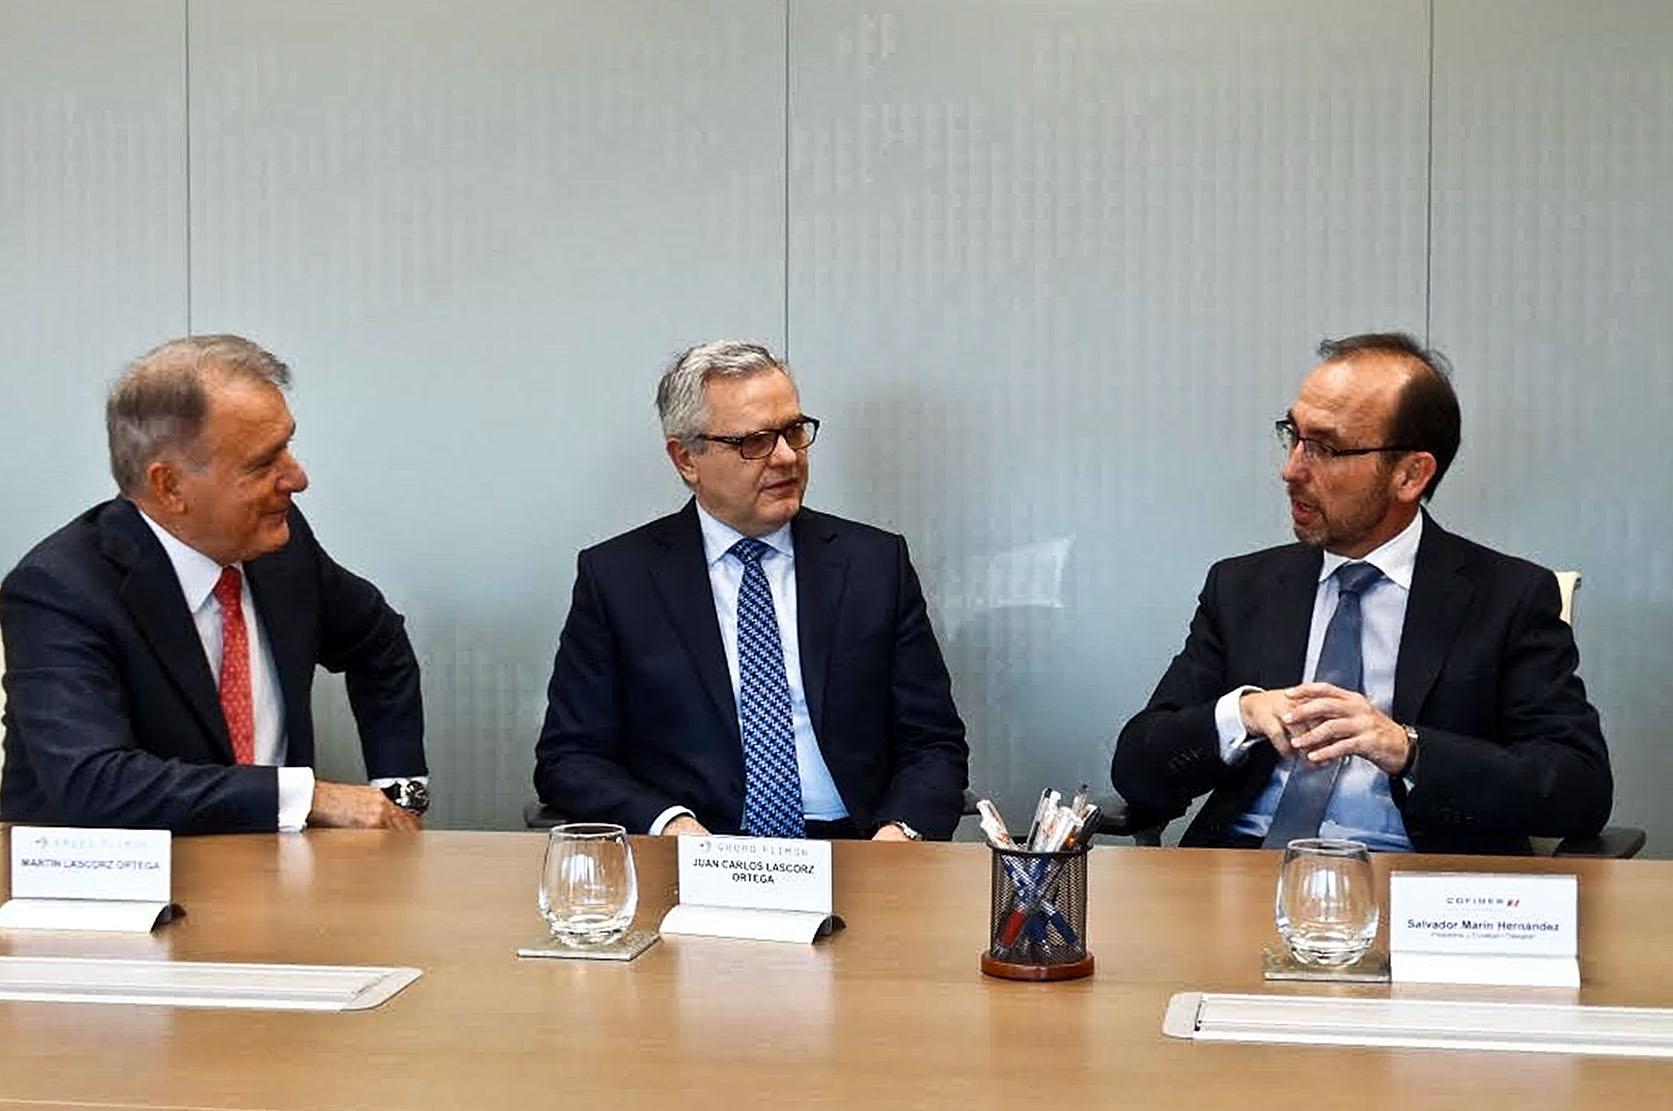 Martín i Juan Carlos Lescorz, responsables del grup Plimon, amb el president de Cofides, Salvador Marín